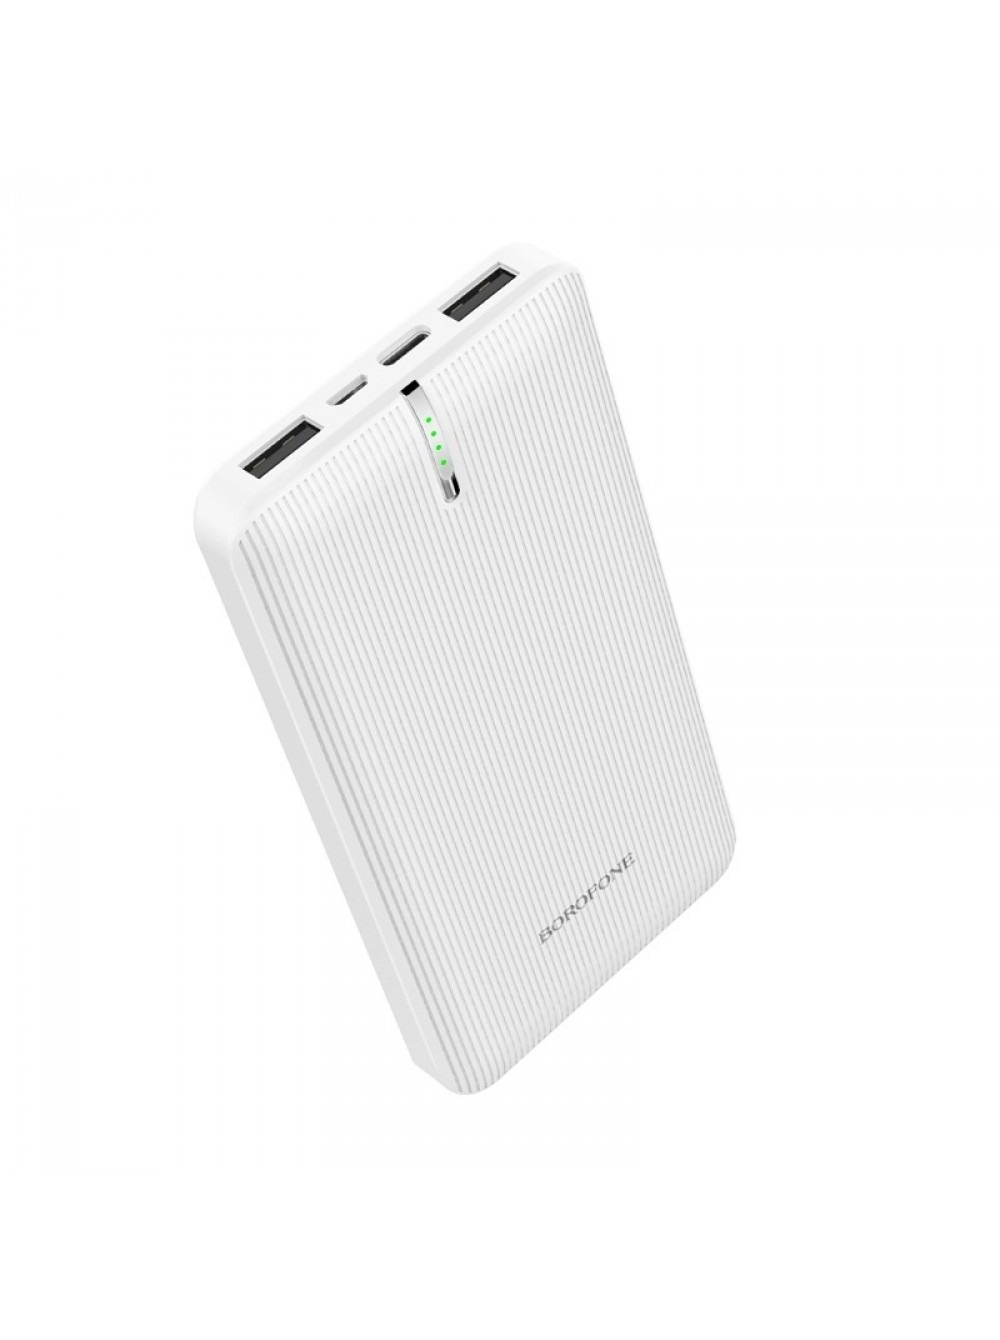 Фото - Внешний аккумулятор Borofone BT18A Prosperous mobile power bank 13000mAh White внешний аккумулятор power bank 13000 мач buro ra 13000 qc3 0 черный